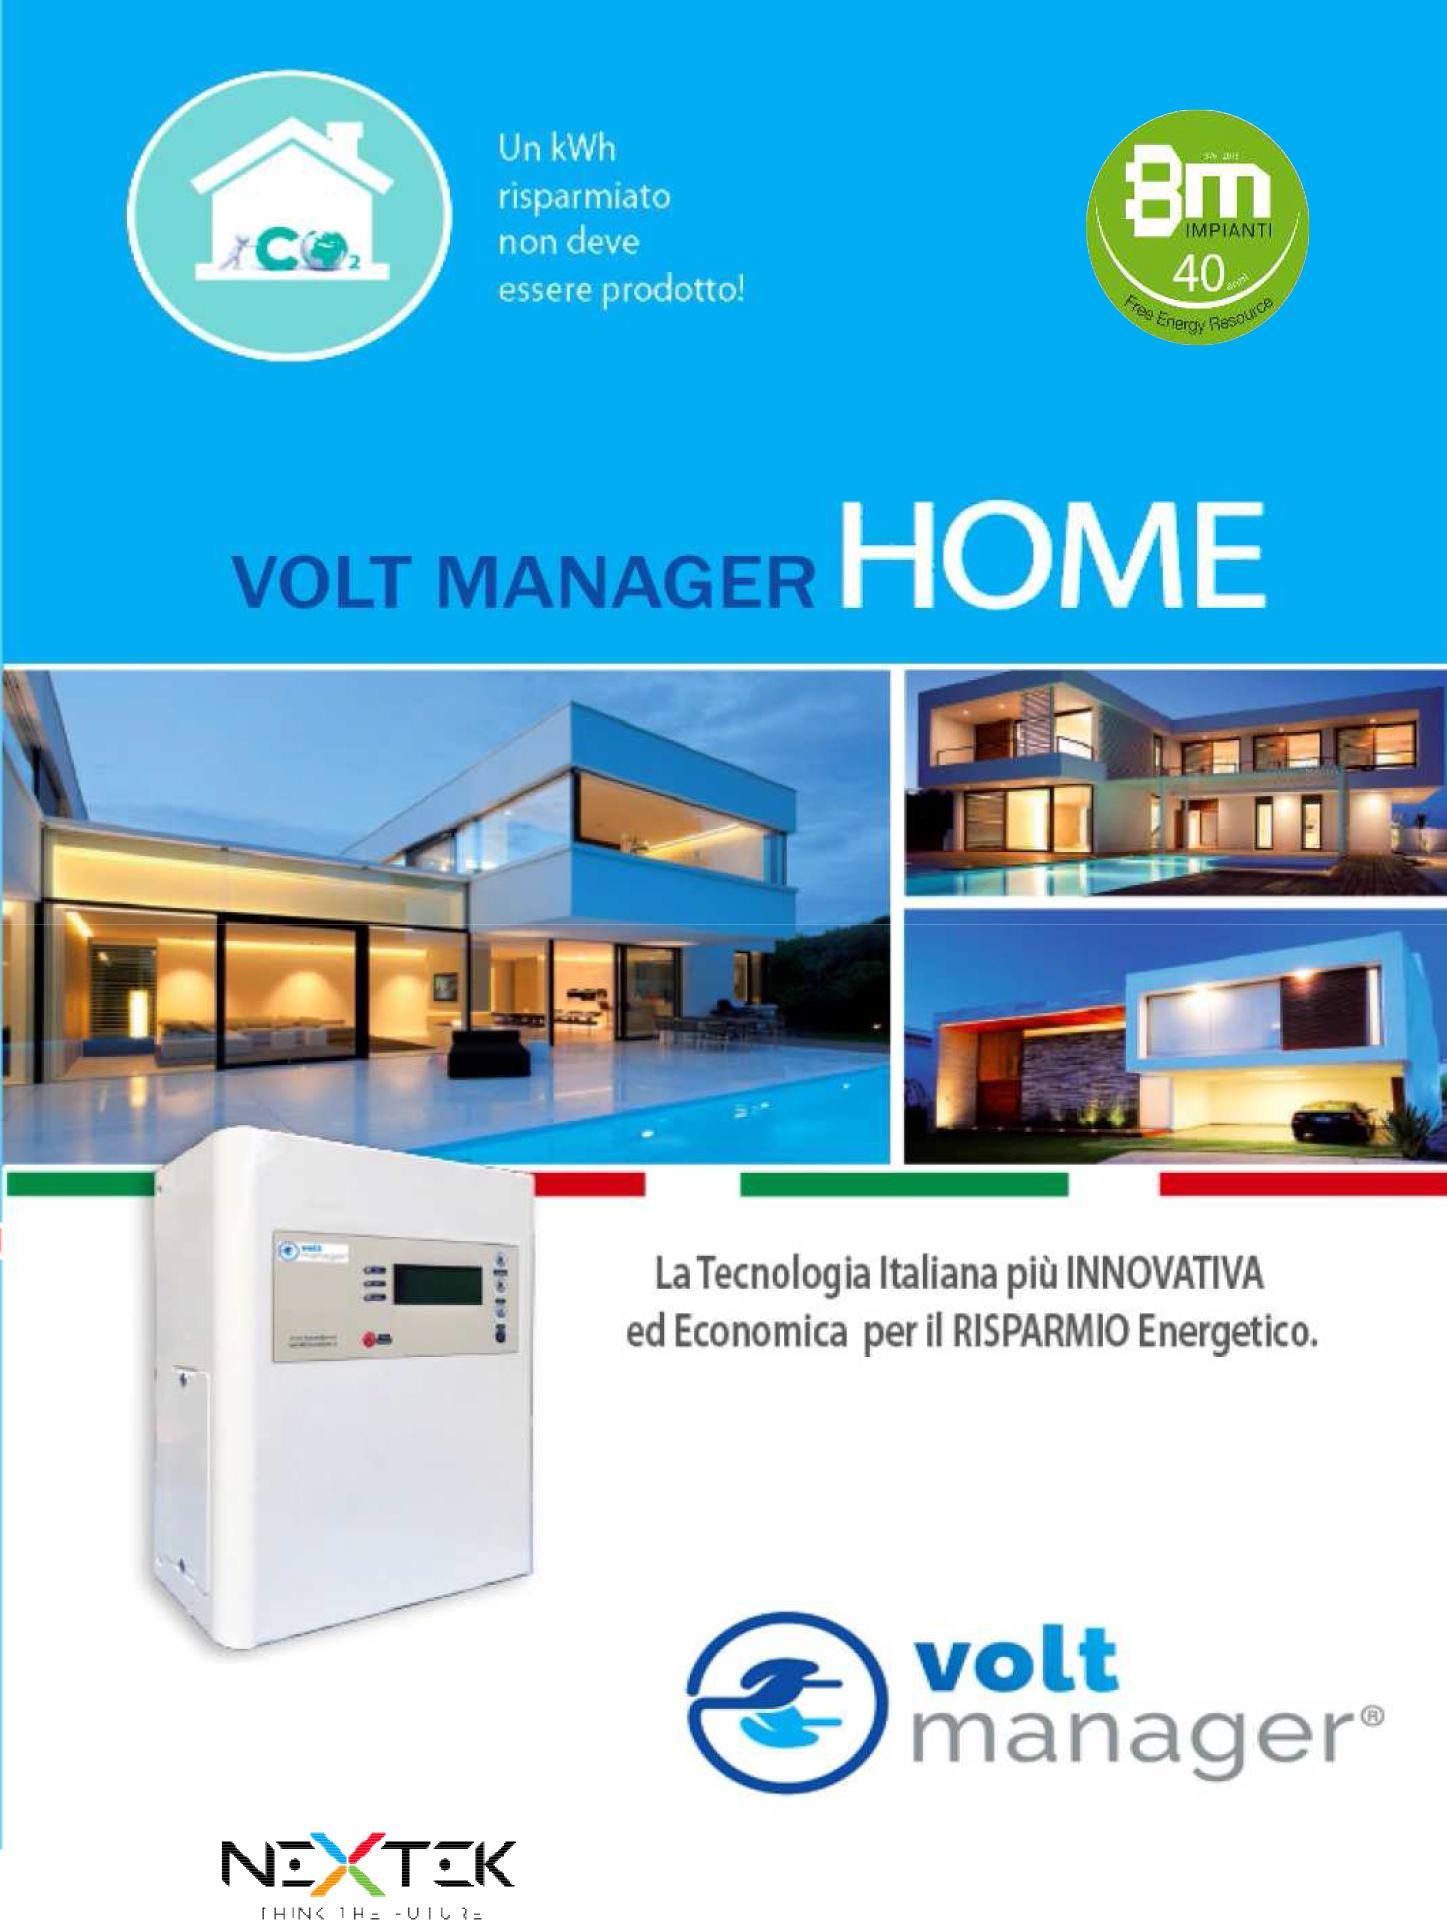 Depliant Volt Manager BM Impianti 2018 OK 1 1